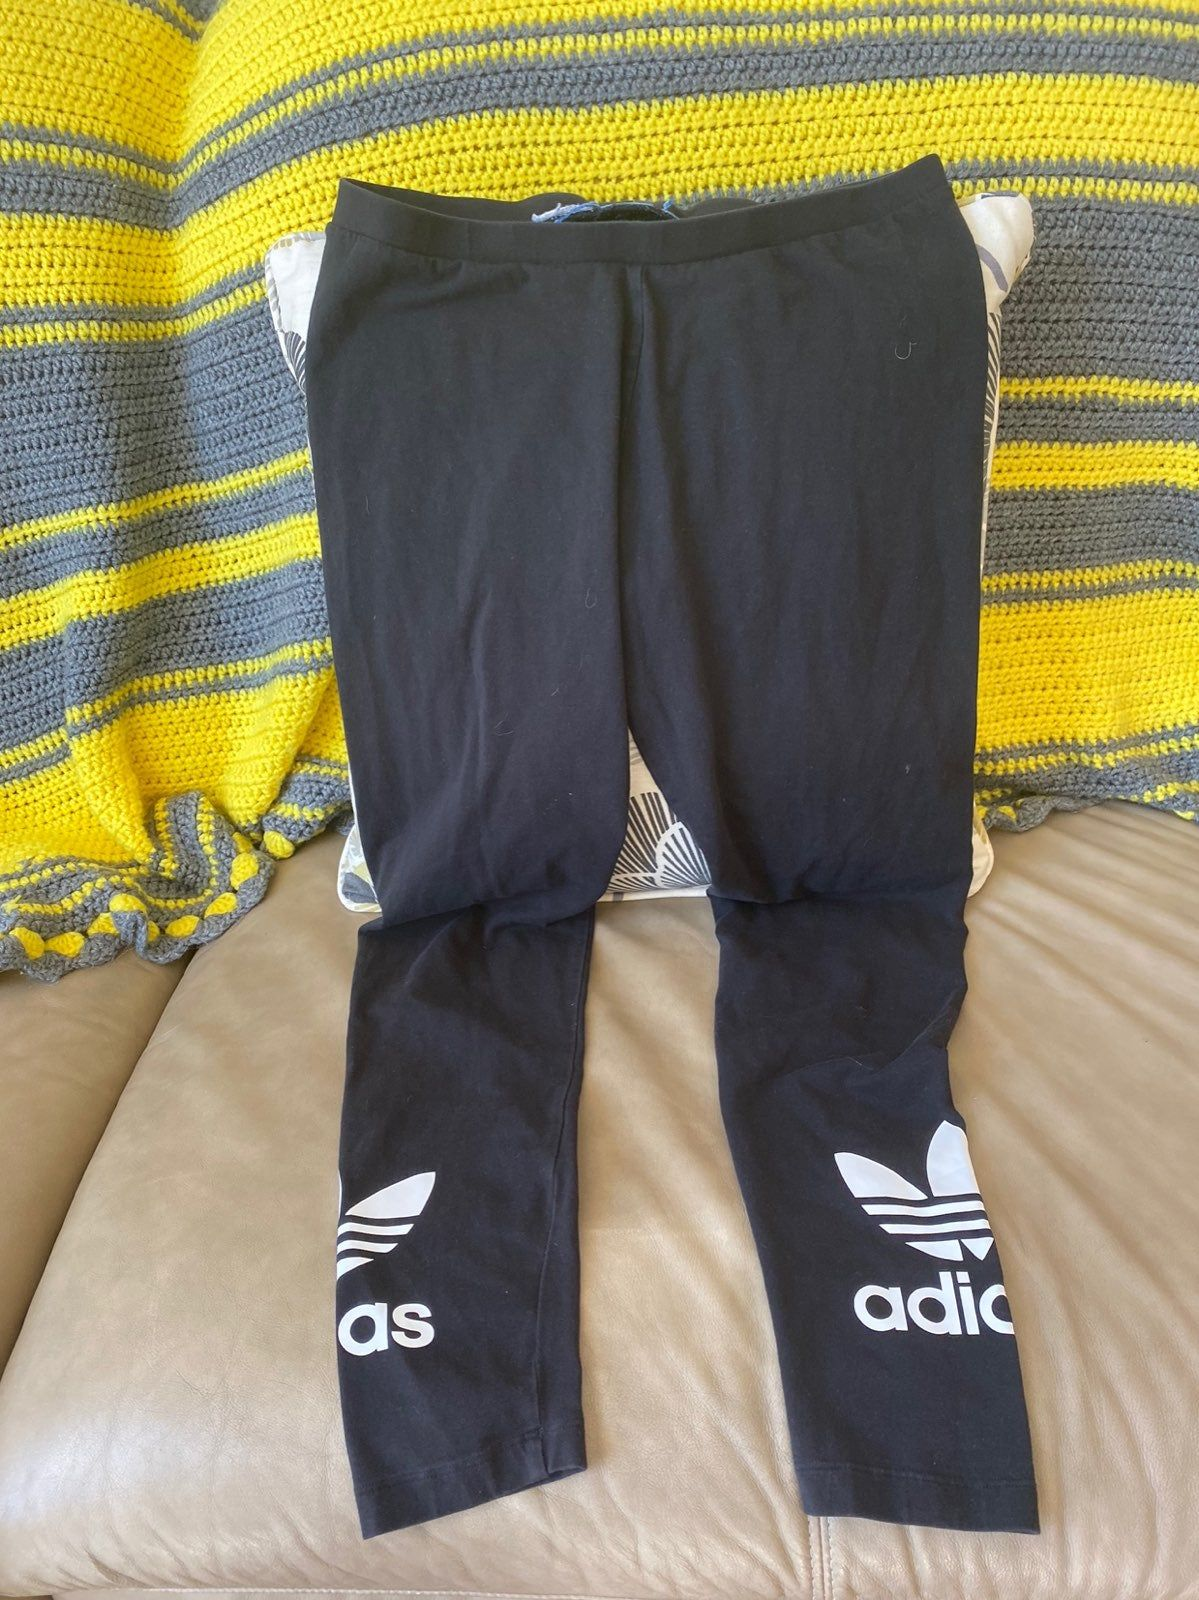 From a smoke free home. | Adidas pants, Gym men, Mens gym short